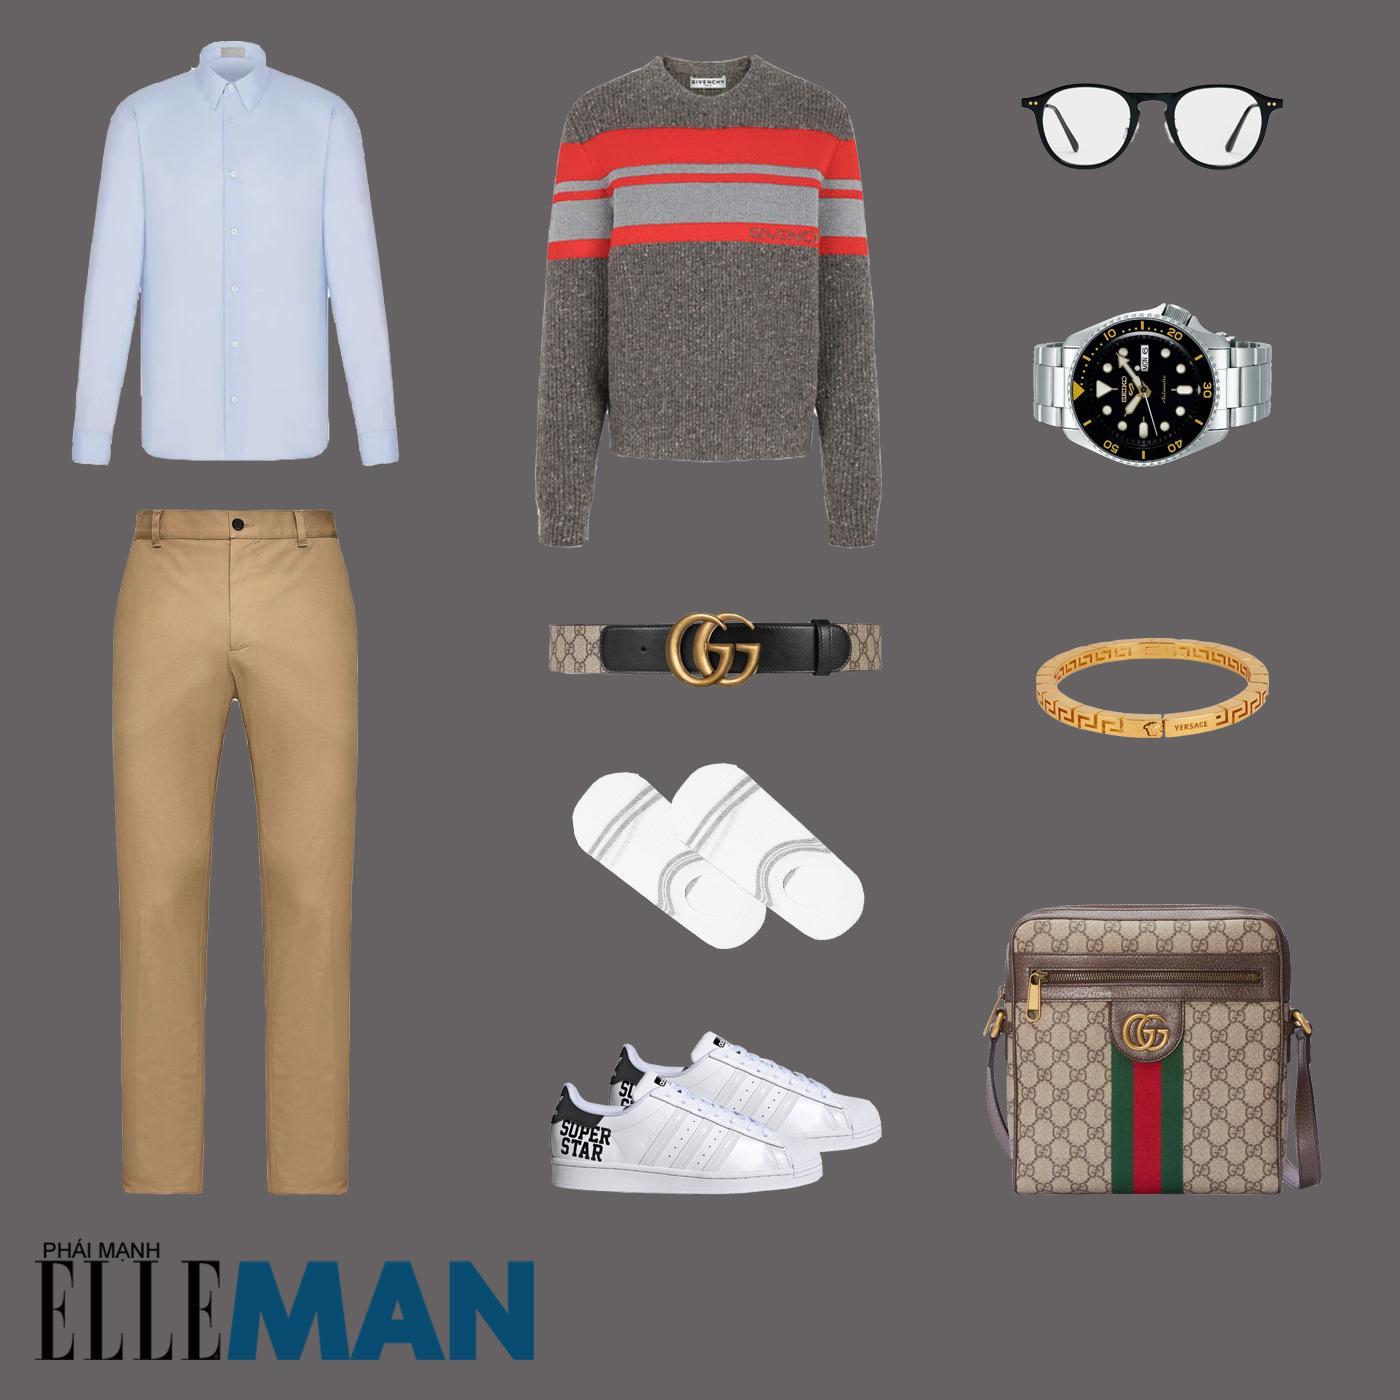 outfit 2 - phối đồ phong cách smart-casual